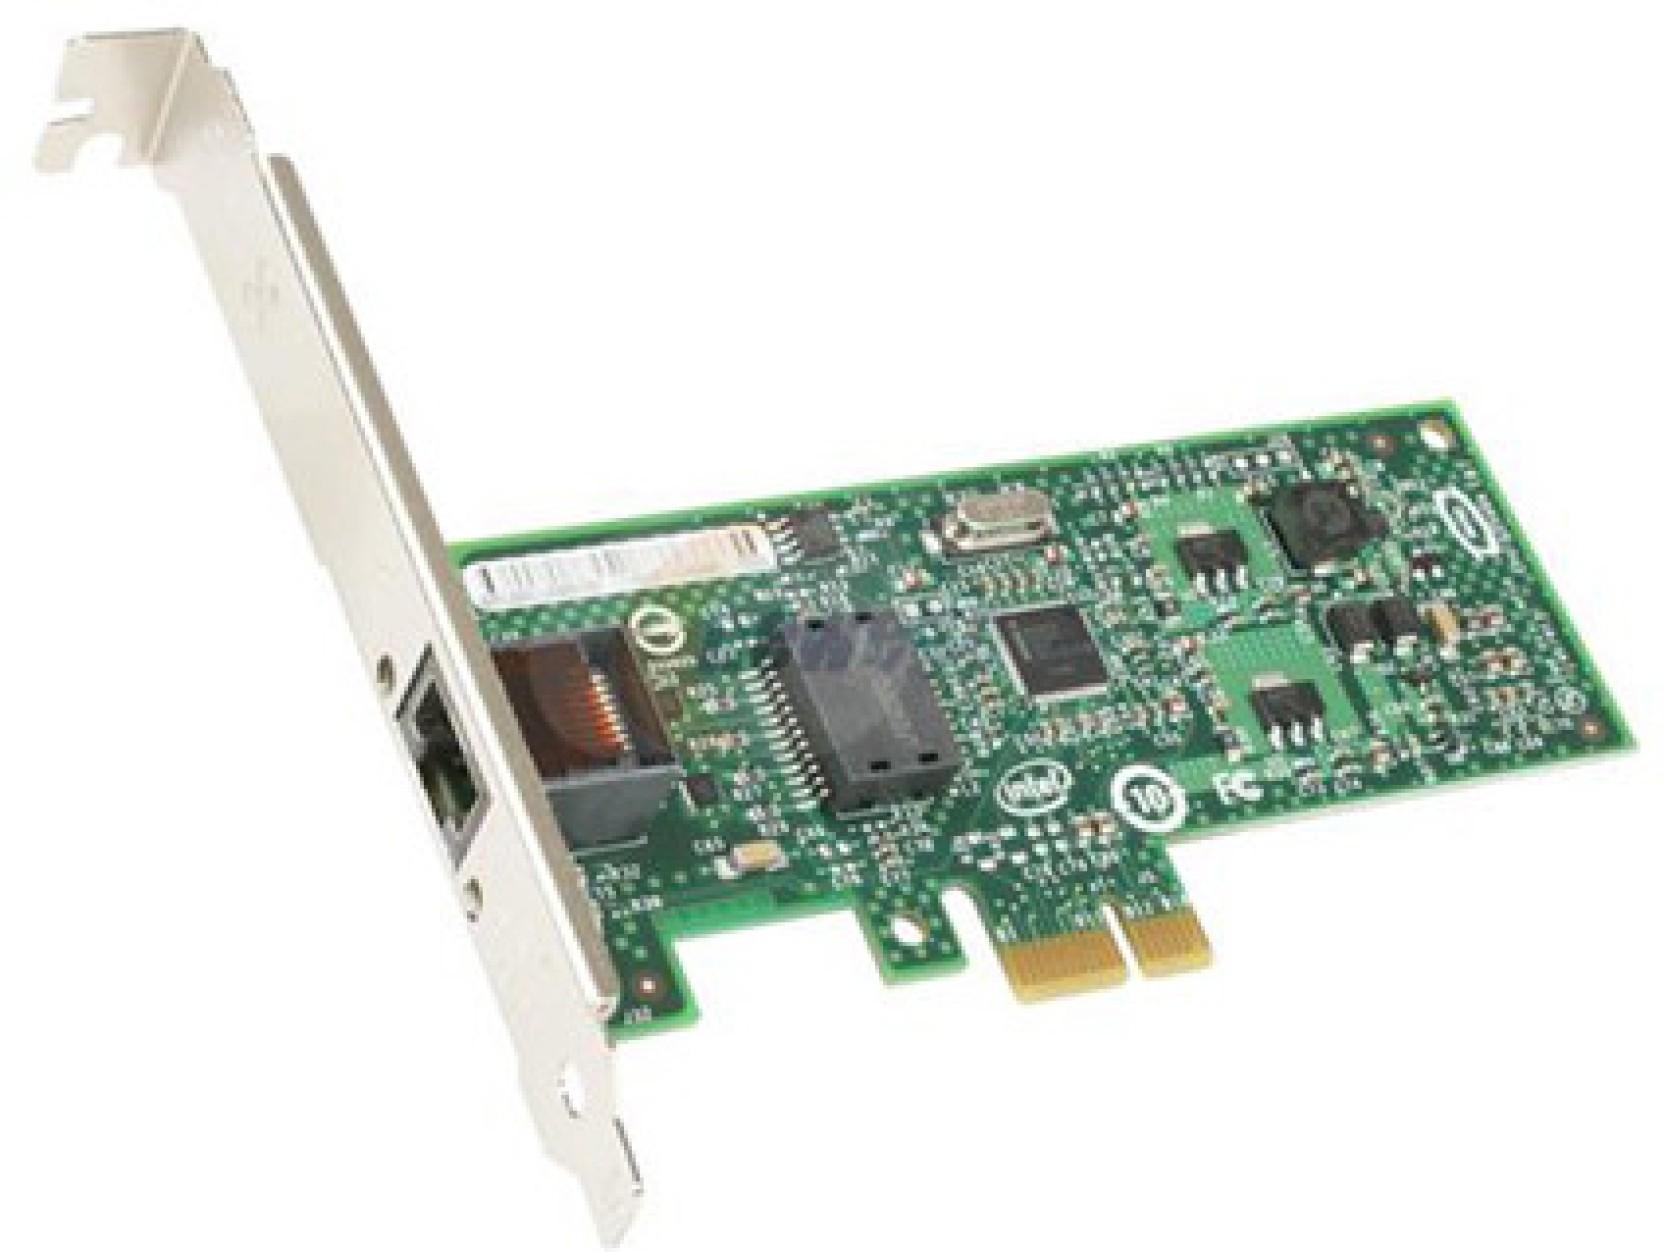 Intel Expi9301ct Pci Express Lan Card Network Interface Gigabit Tg 3468 Share